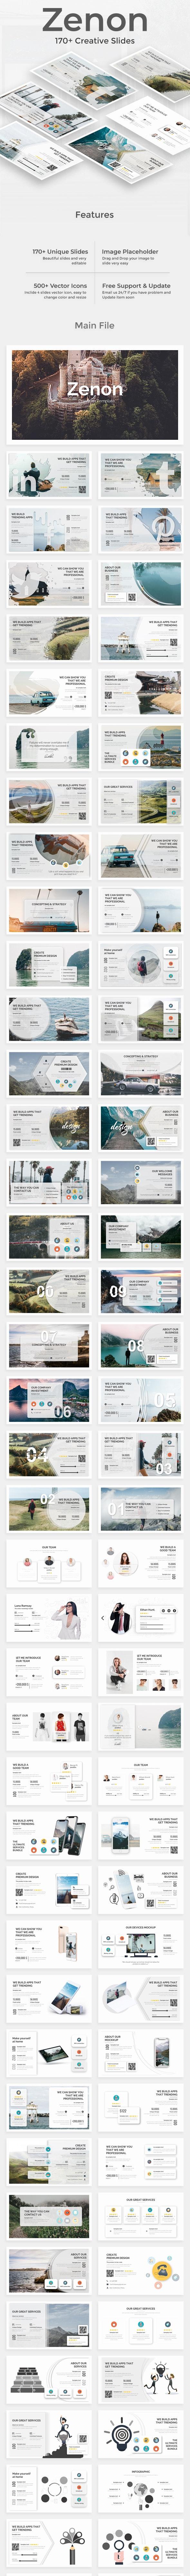 Zenon Creative Premium Keynote Template - Creative Keynote Templates